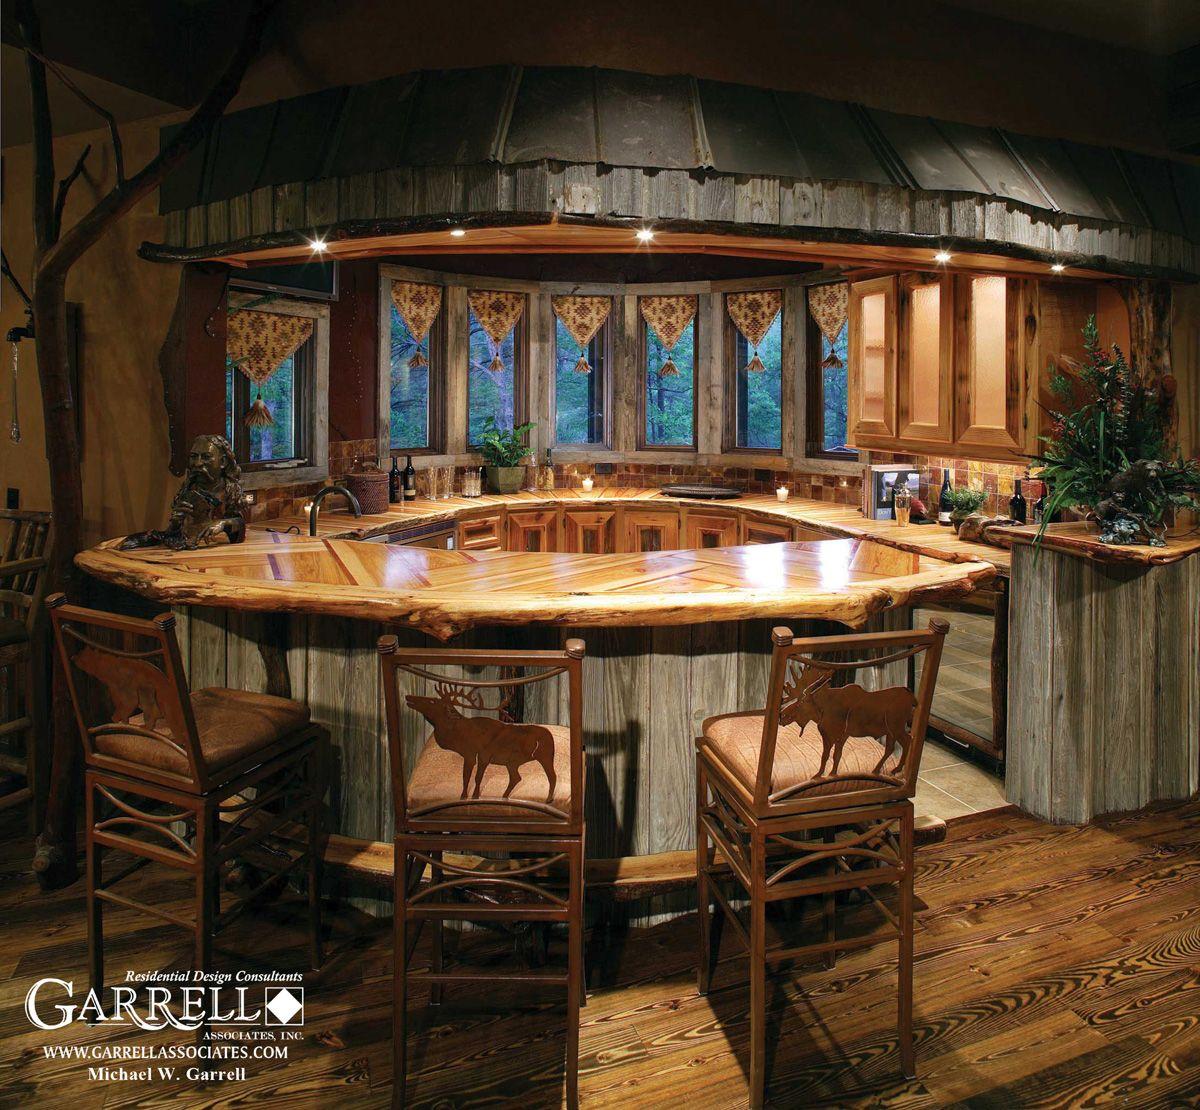 Tranquility 04159 Garrell Associates Inc Cottage Style House Plans Craftsman House Plans Rustic House Plans